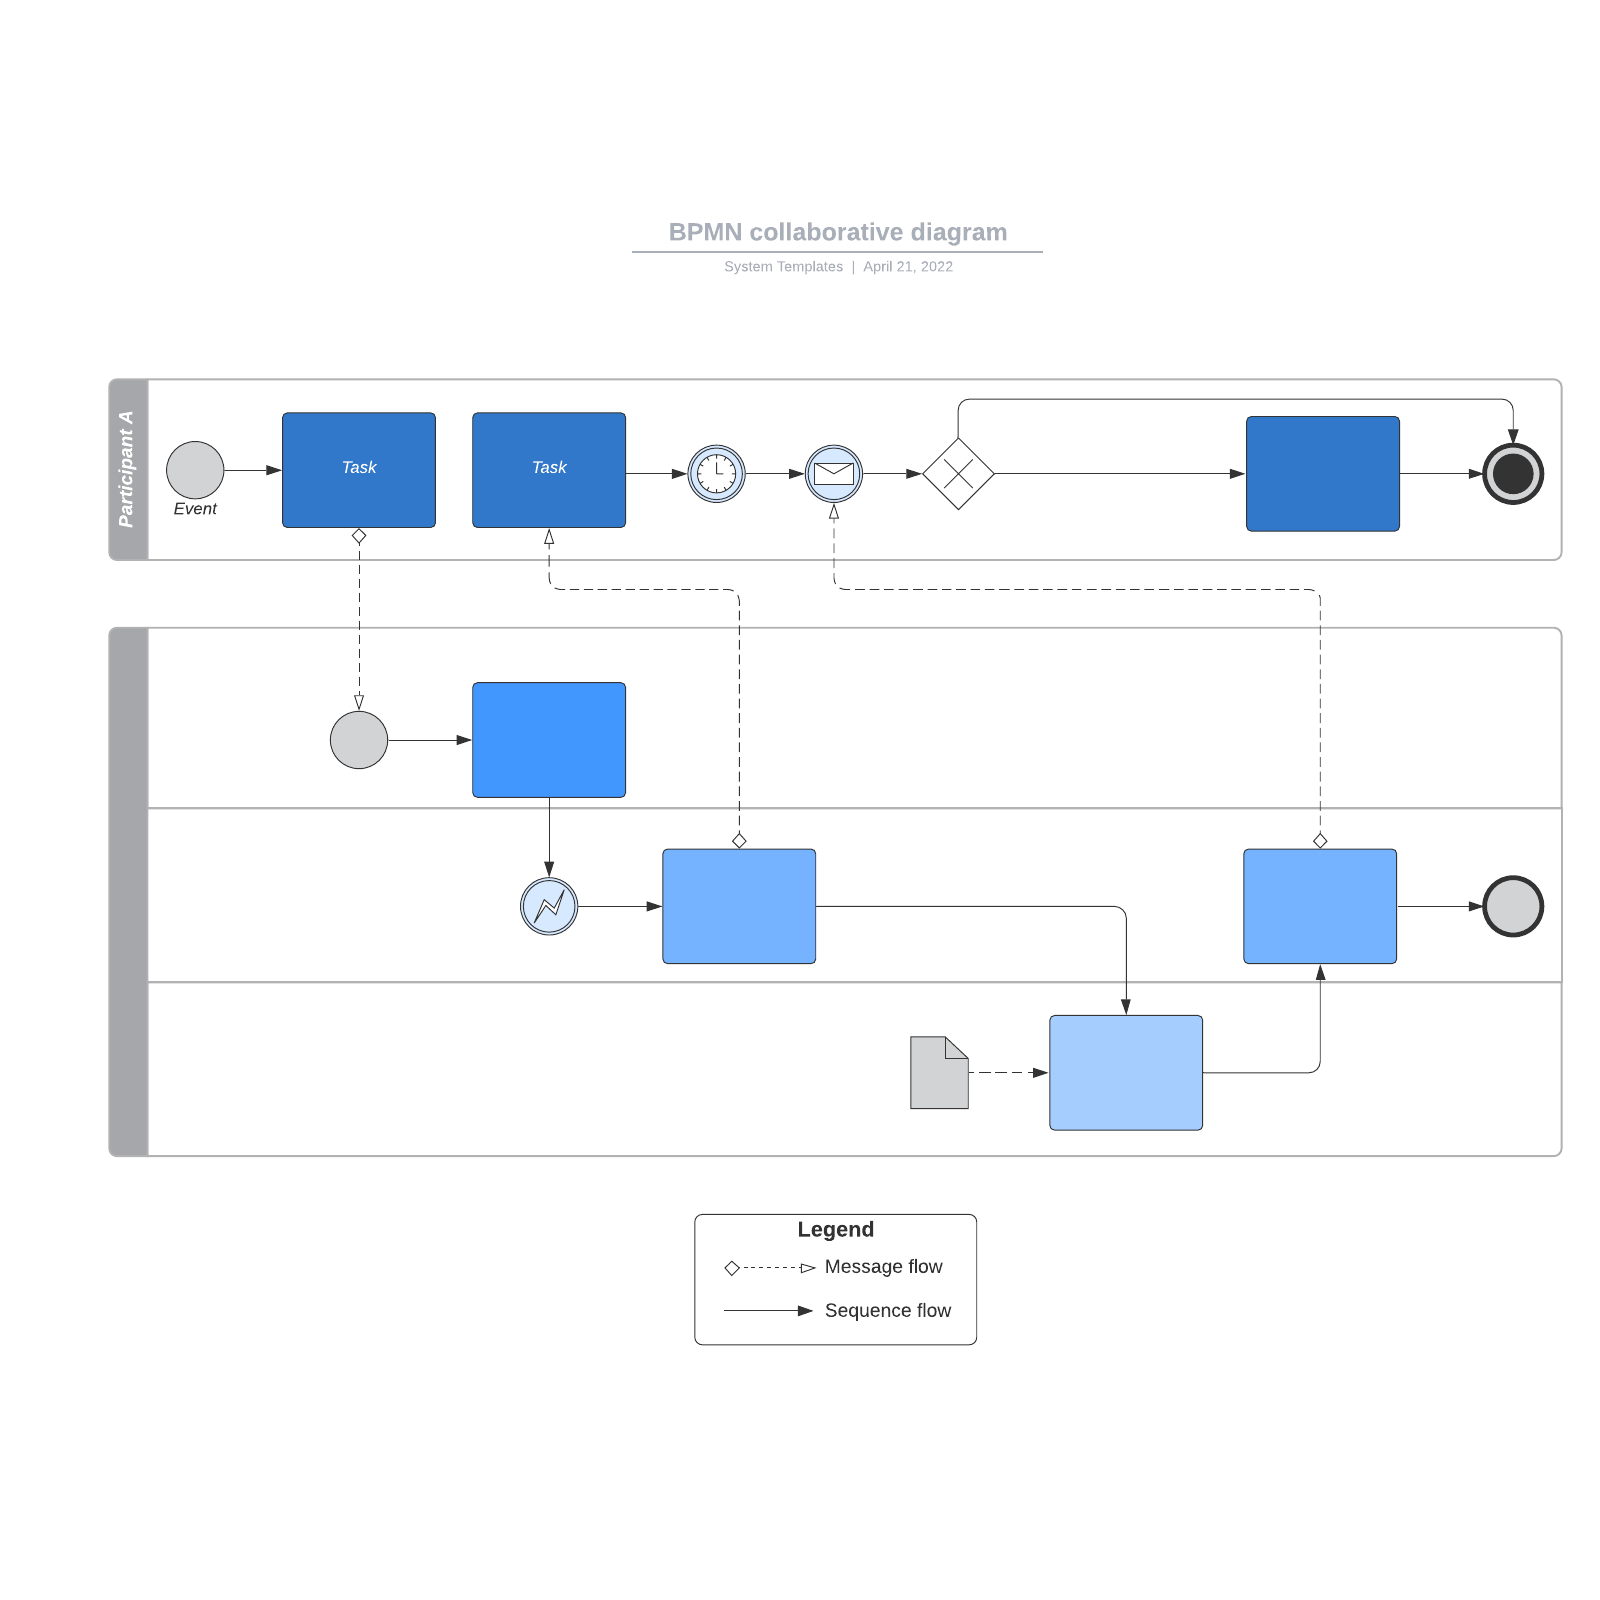 BPMN collaborative diagram